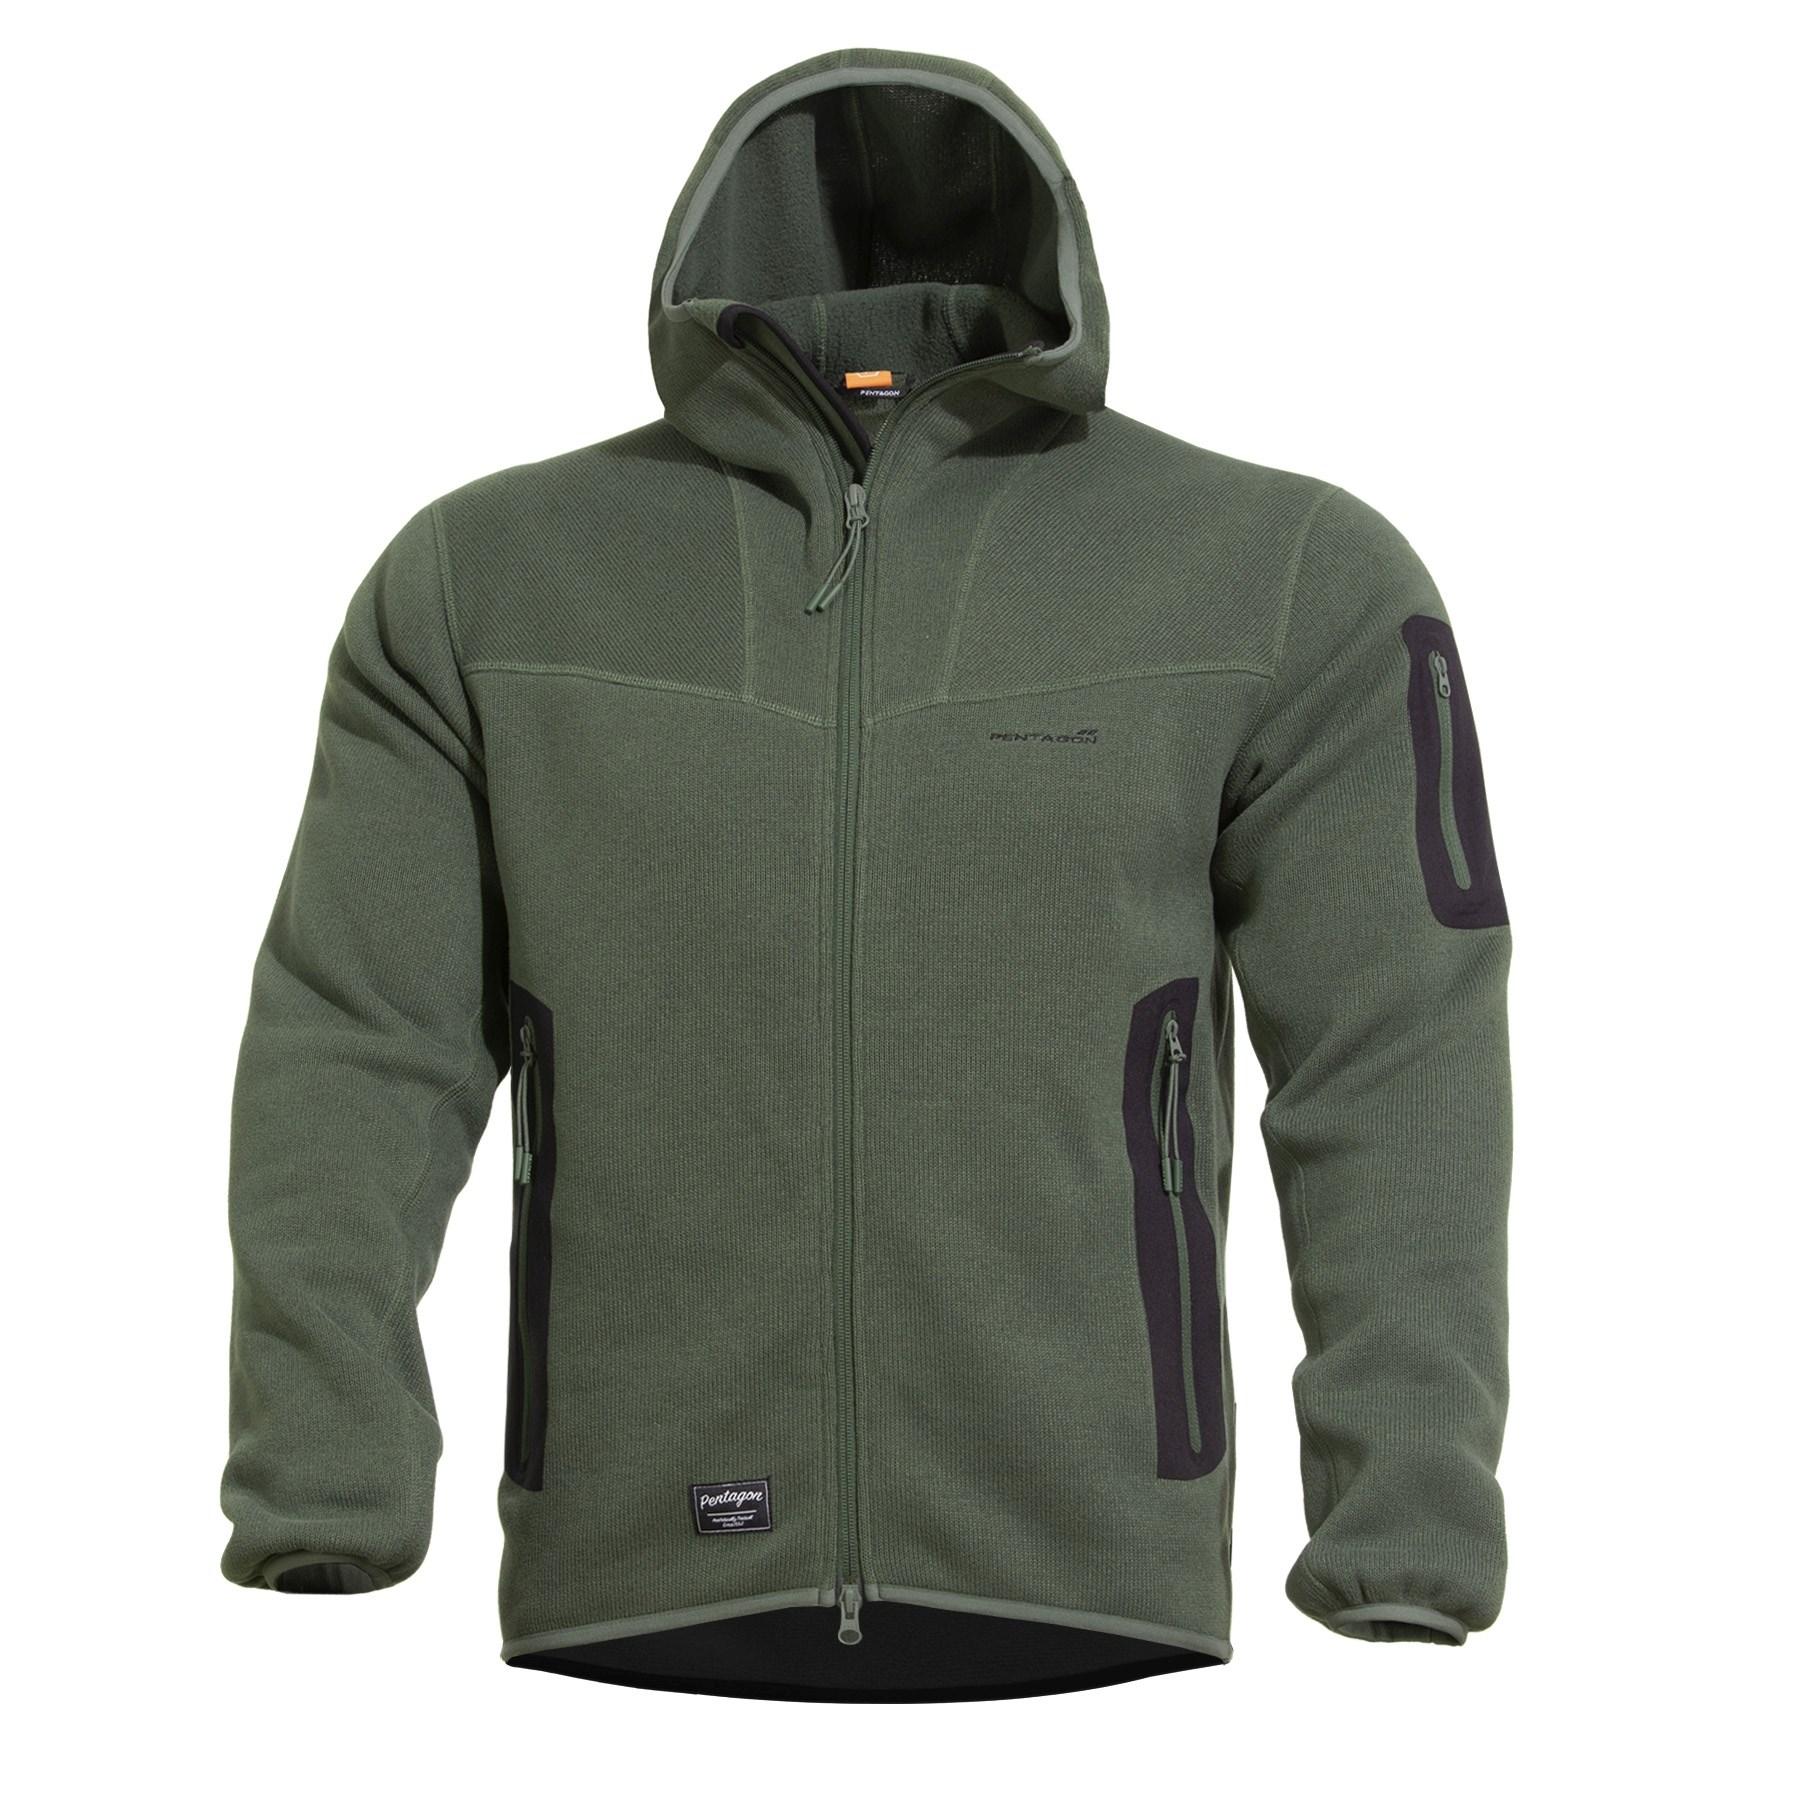 Falcon Pro Sweater CAMO GREEN PENTAGON K08036-06CG L-11